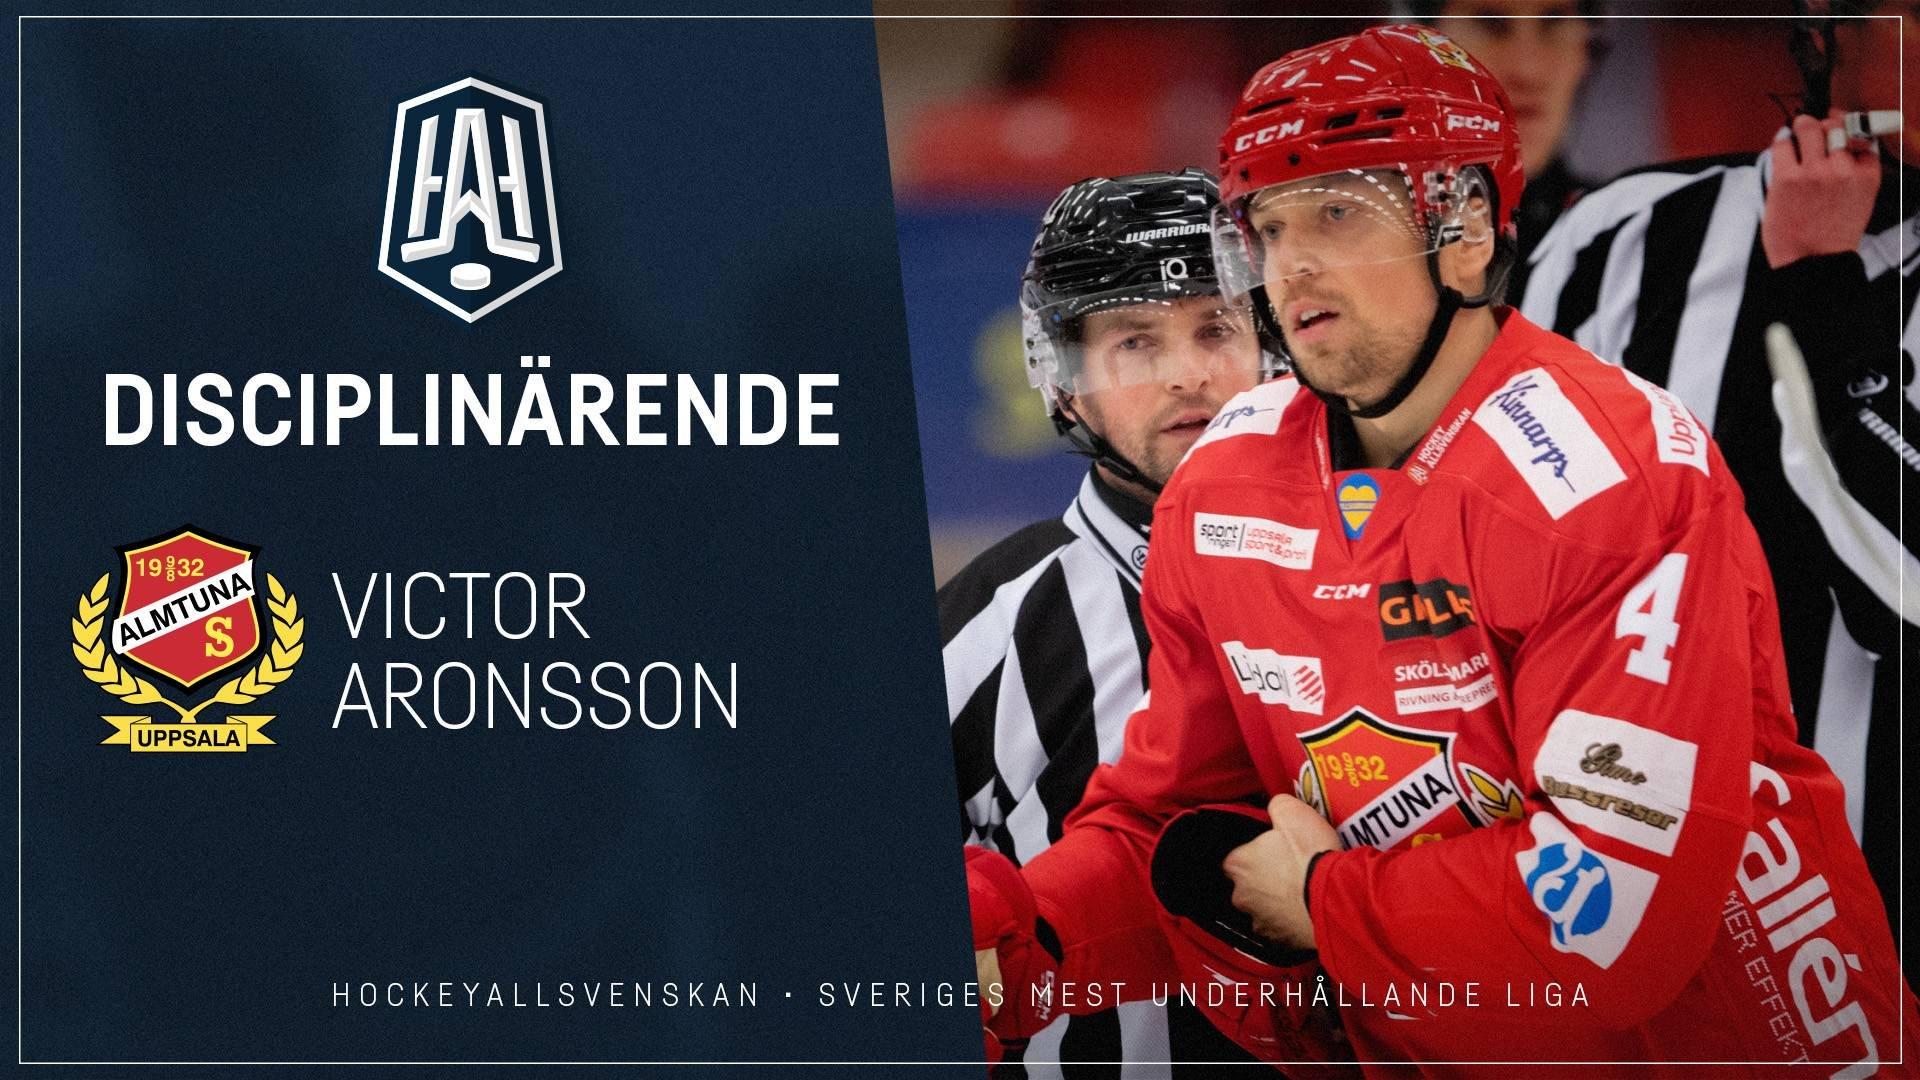 Disciplinärende: Victor Aronsson, Almtuna